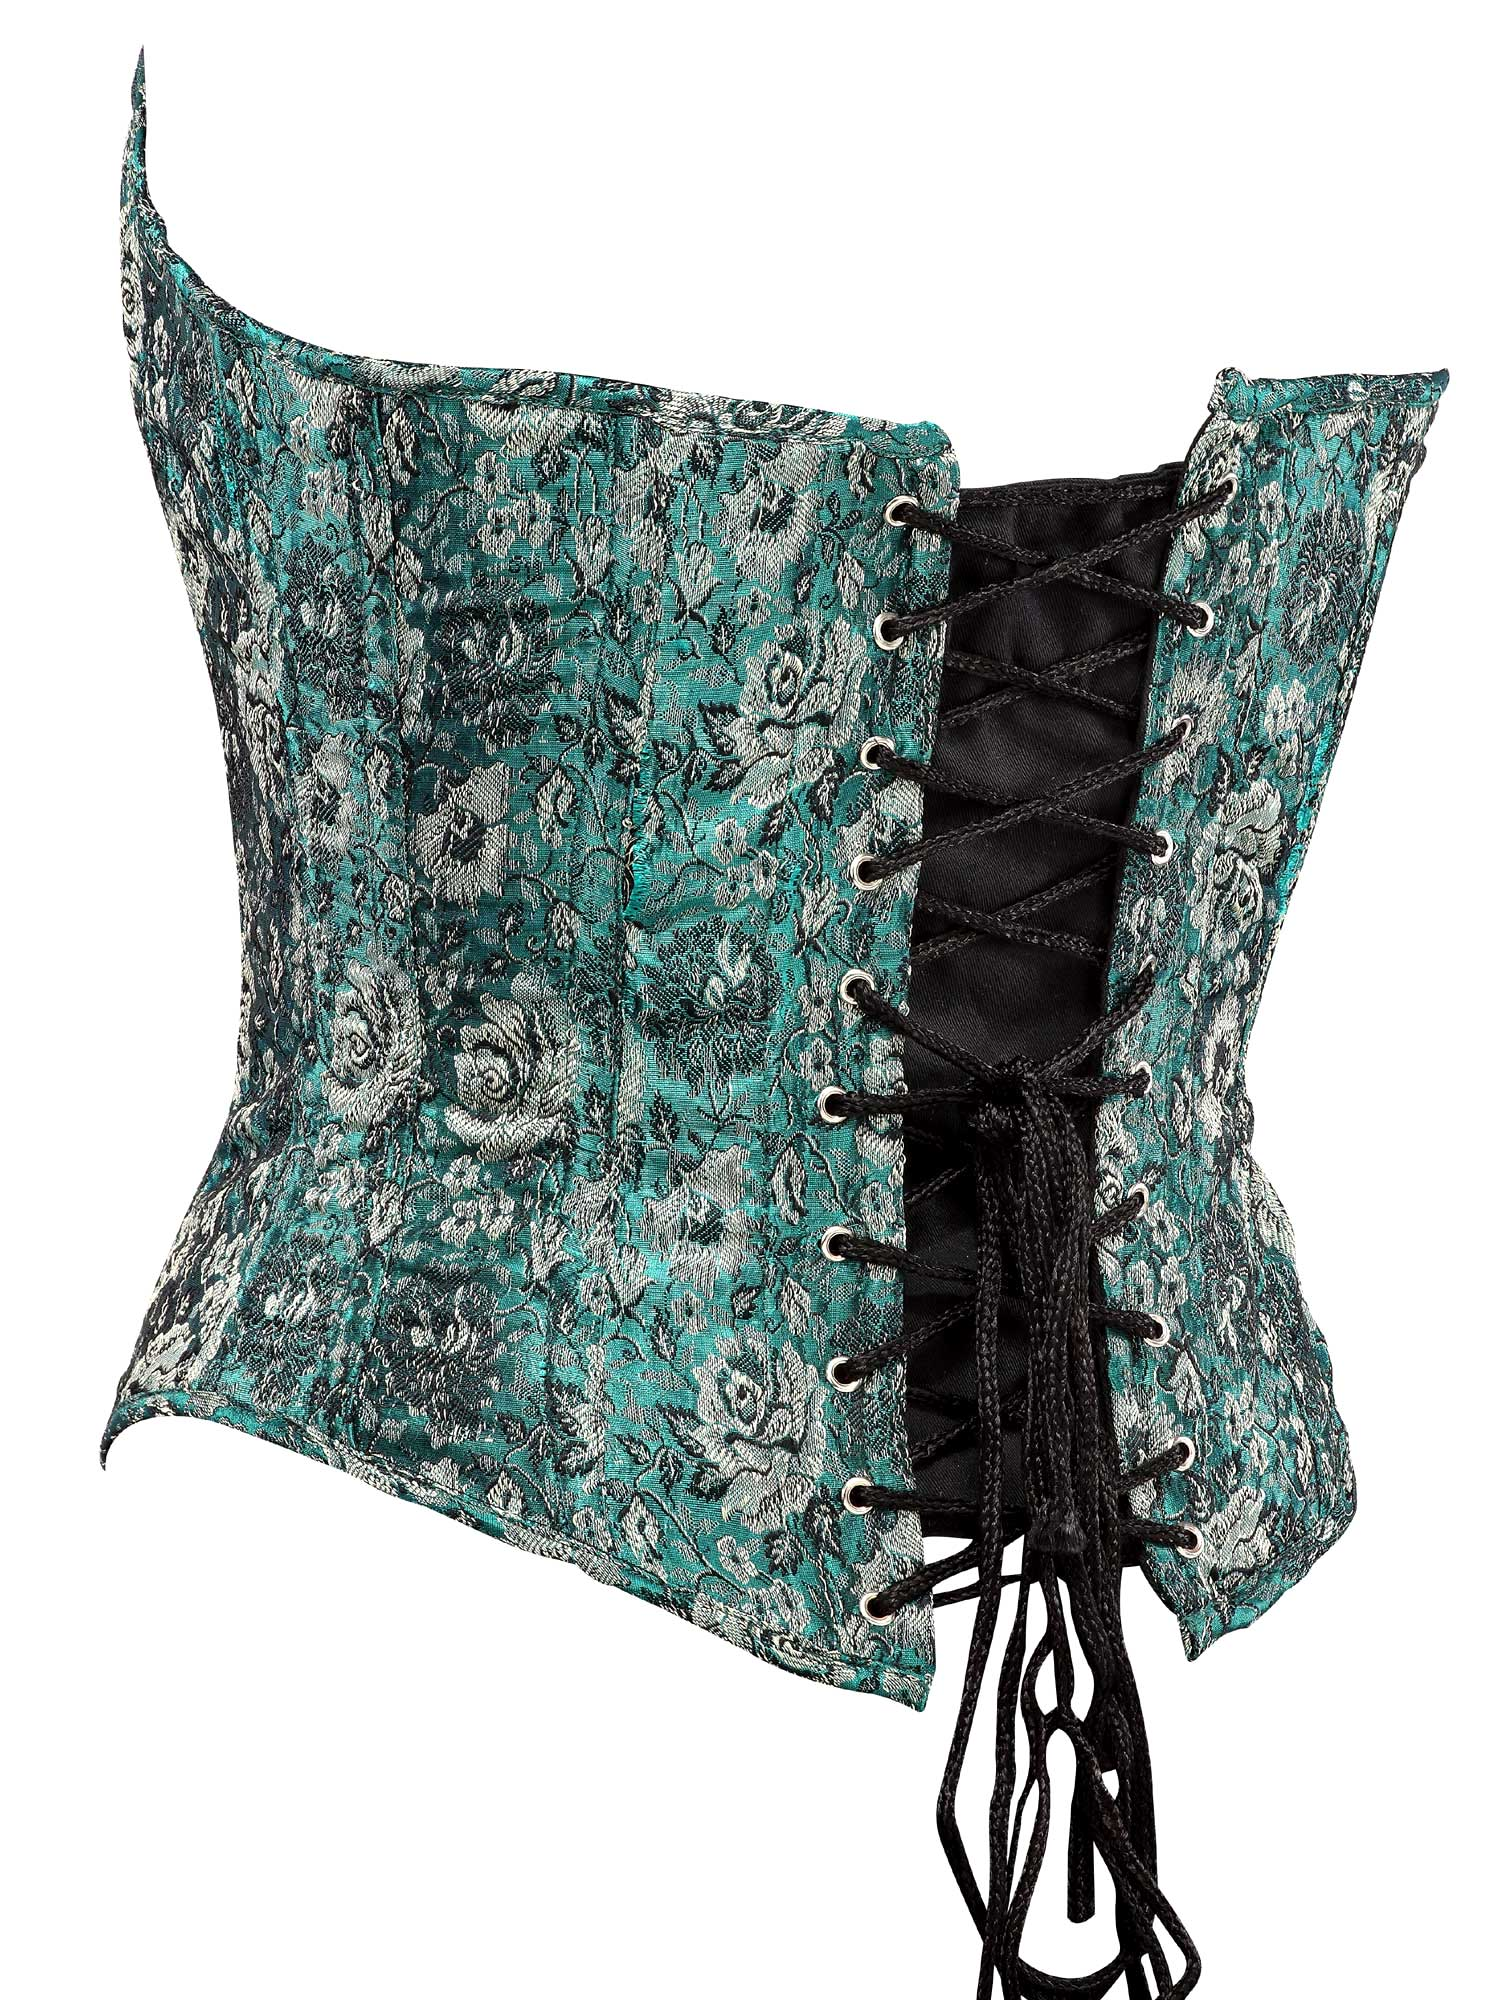 green_floral_jacquard_fabric_steel_boning_corset_waist_cincher_bustier_bustiers_and_corsets_3.jpg